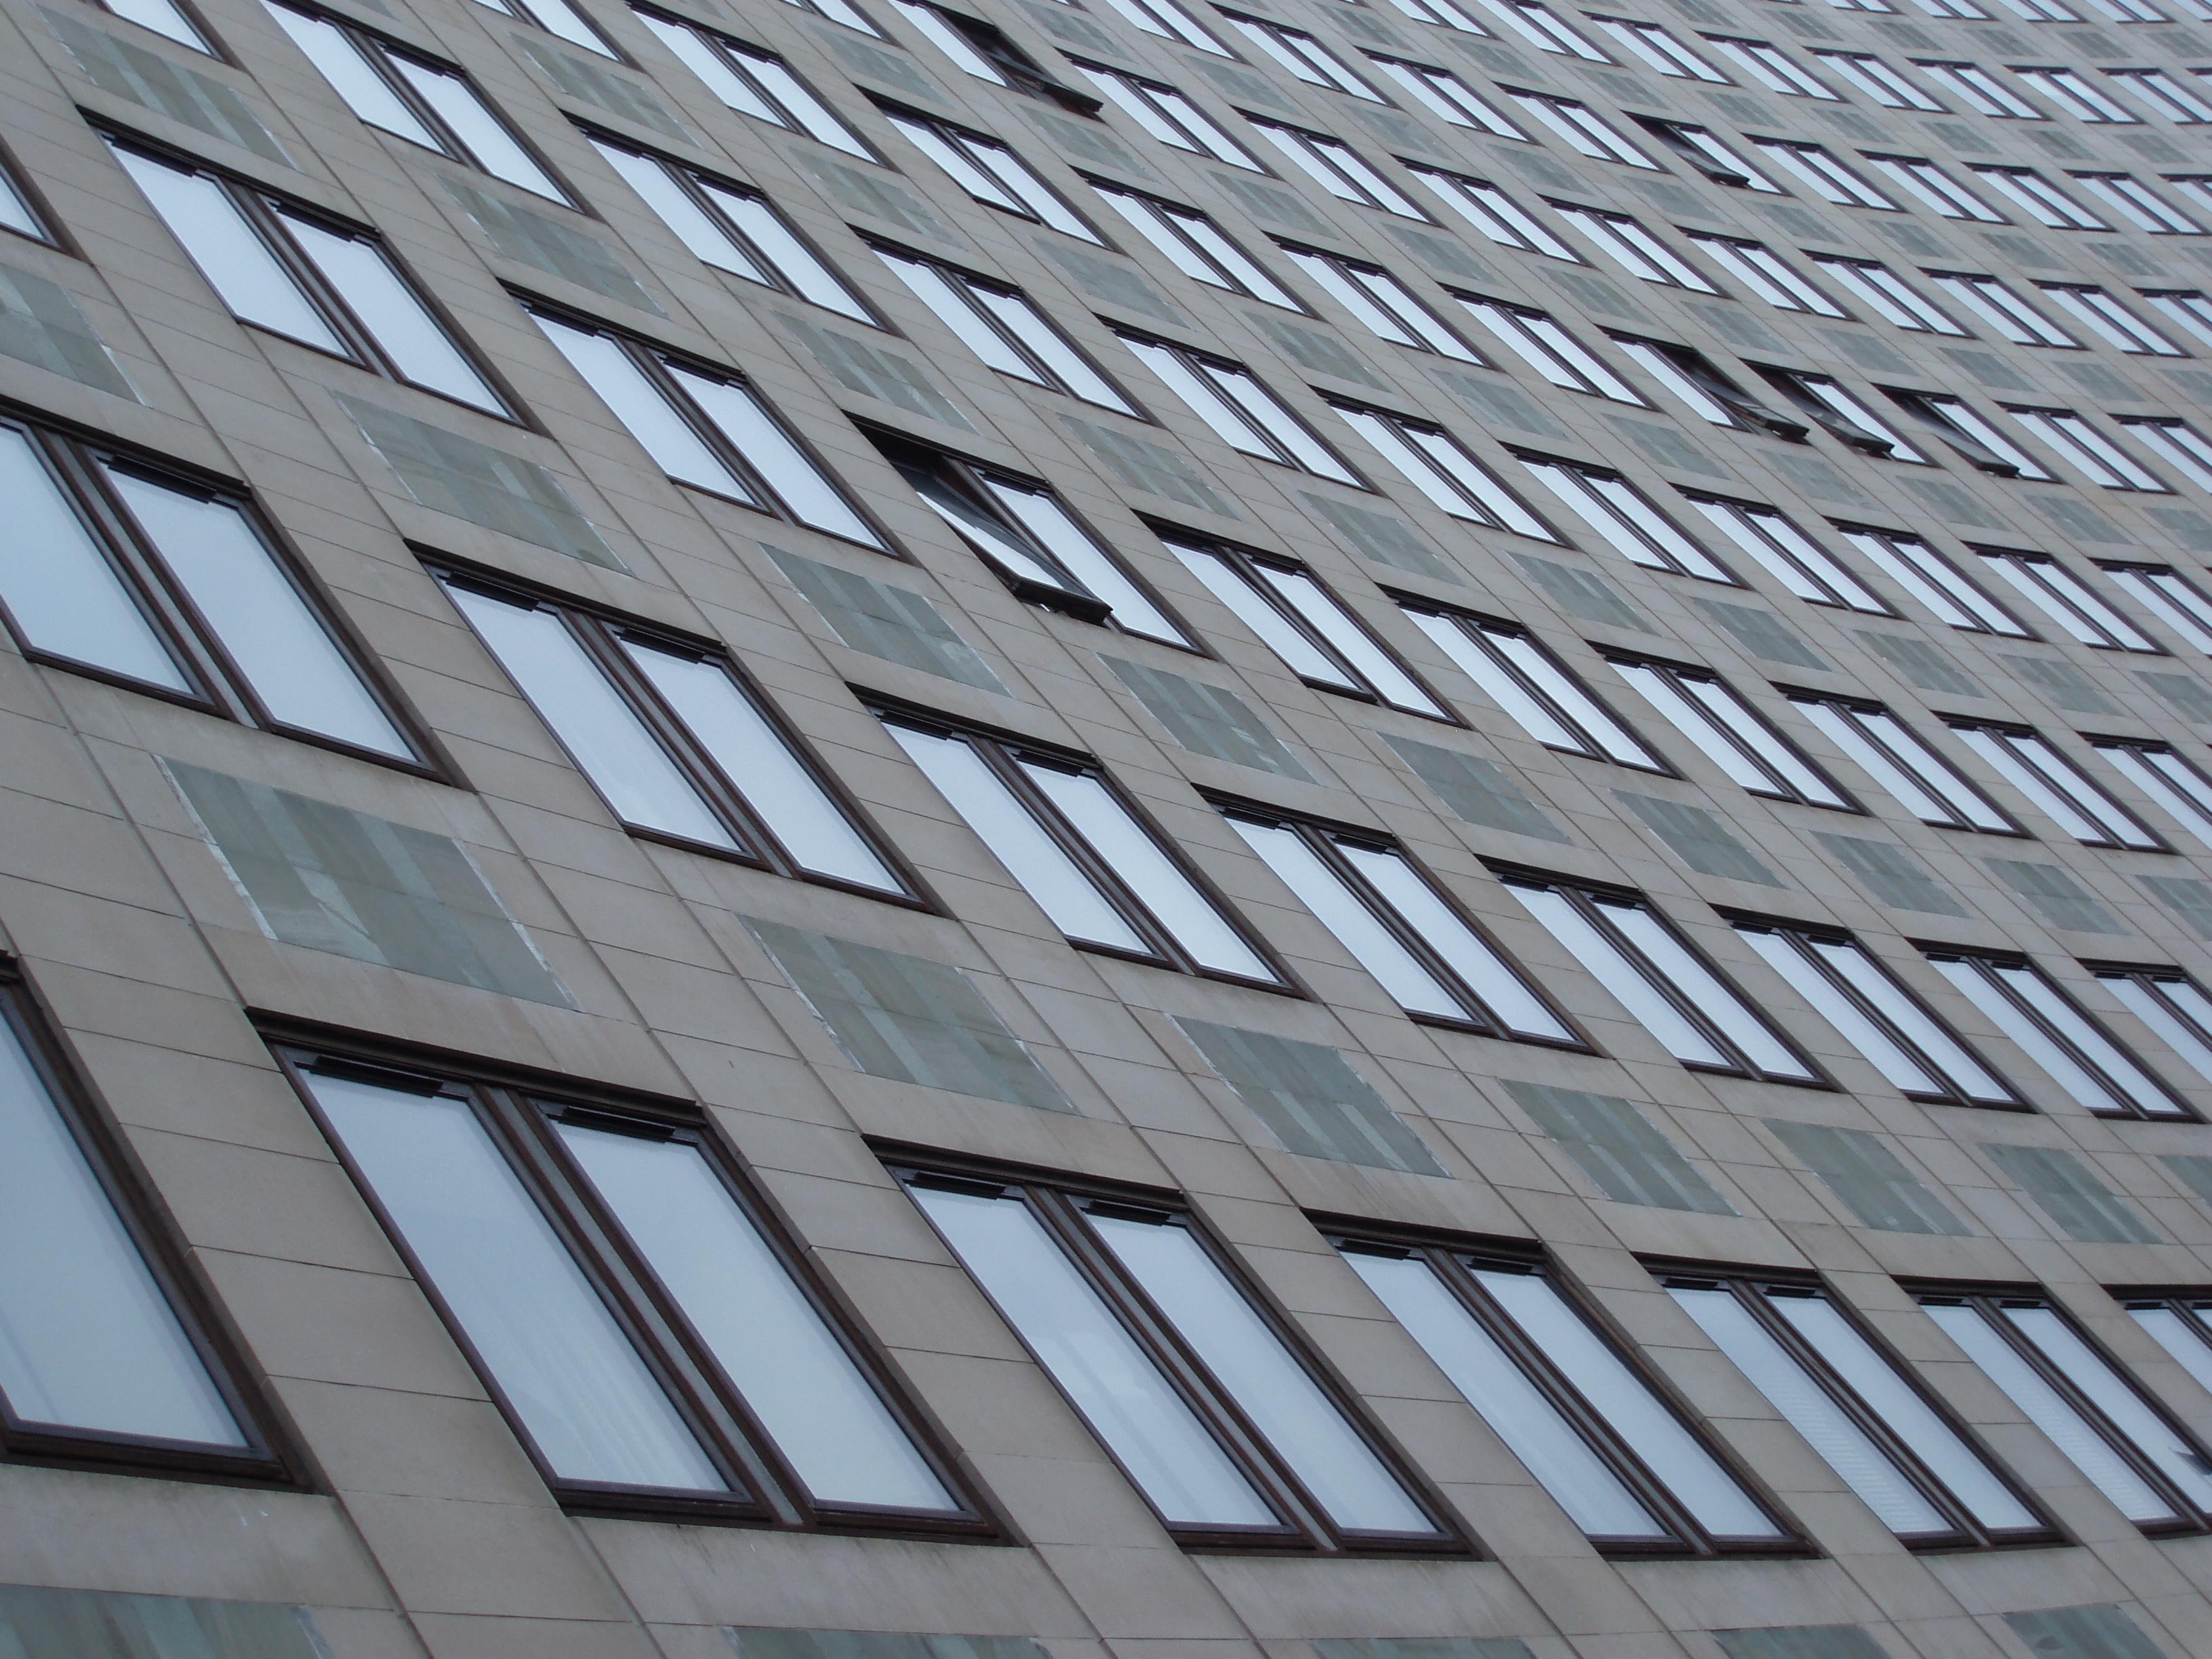 stockvault-office-windows109431.jpg